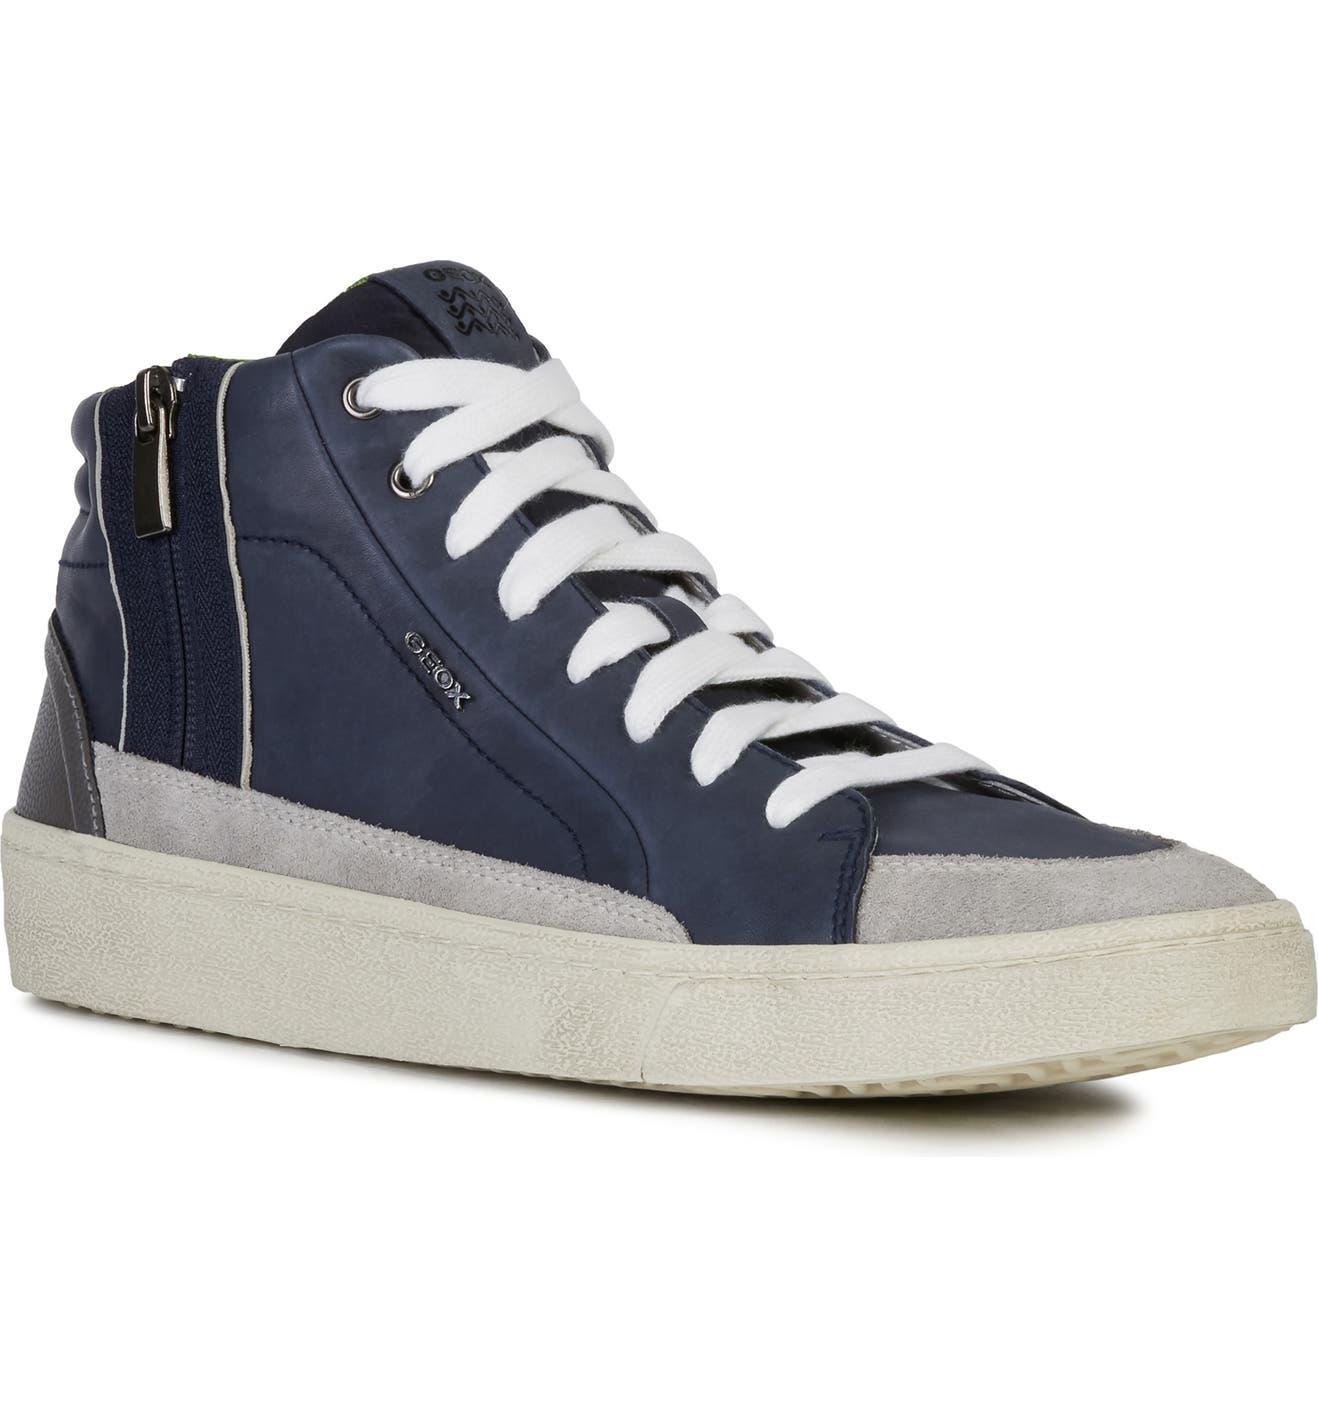 Geox Warley 8 High Top Sneaker (Men) | Nordstrom